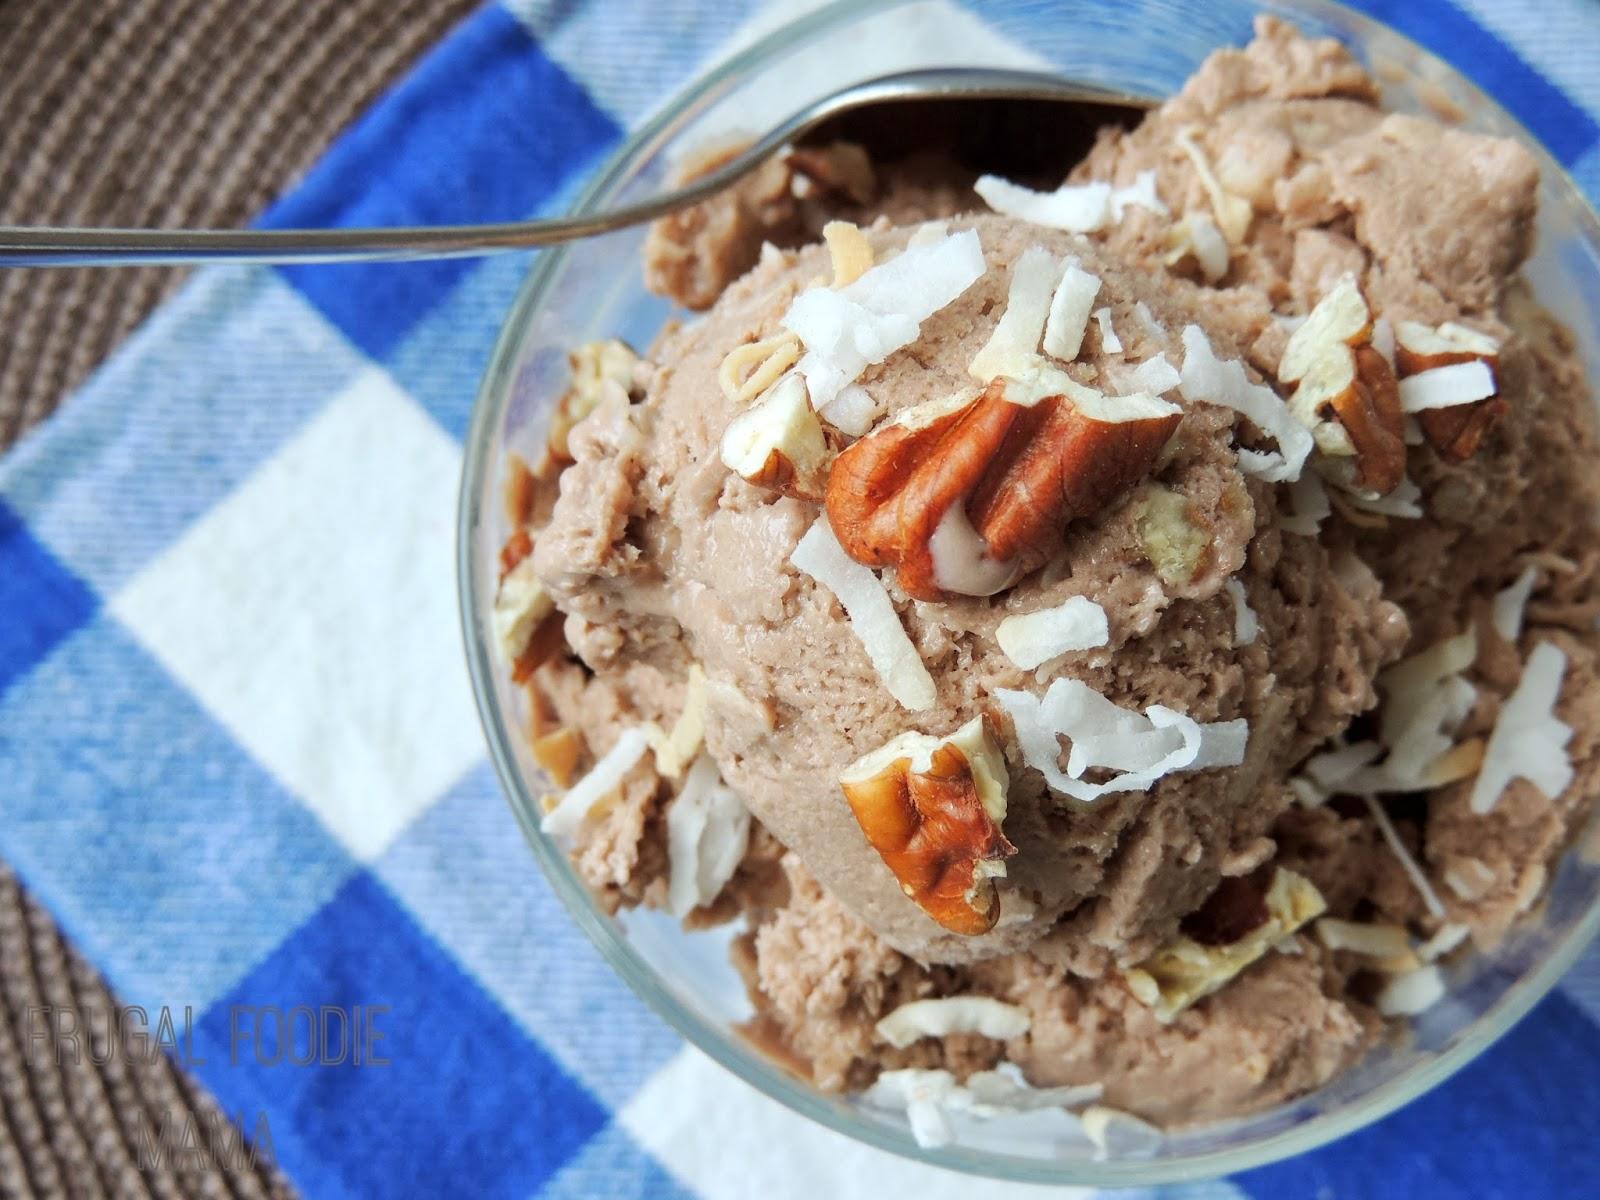 http://www.thefrugalfoodiemama.com/2014/03/skinny-german-chocolate-ice-cream_10.html